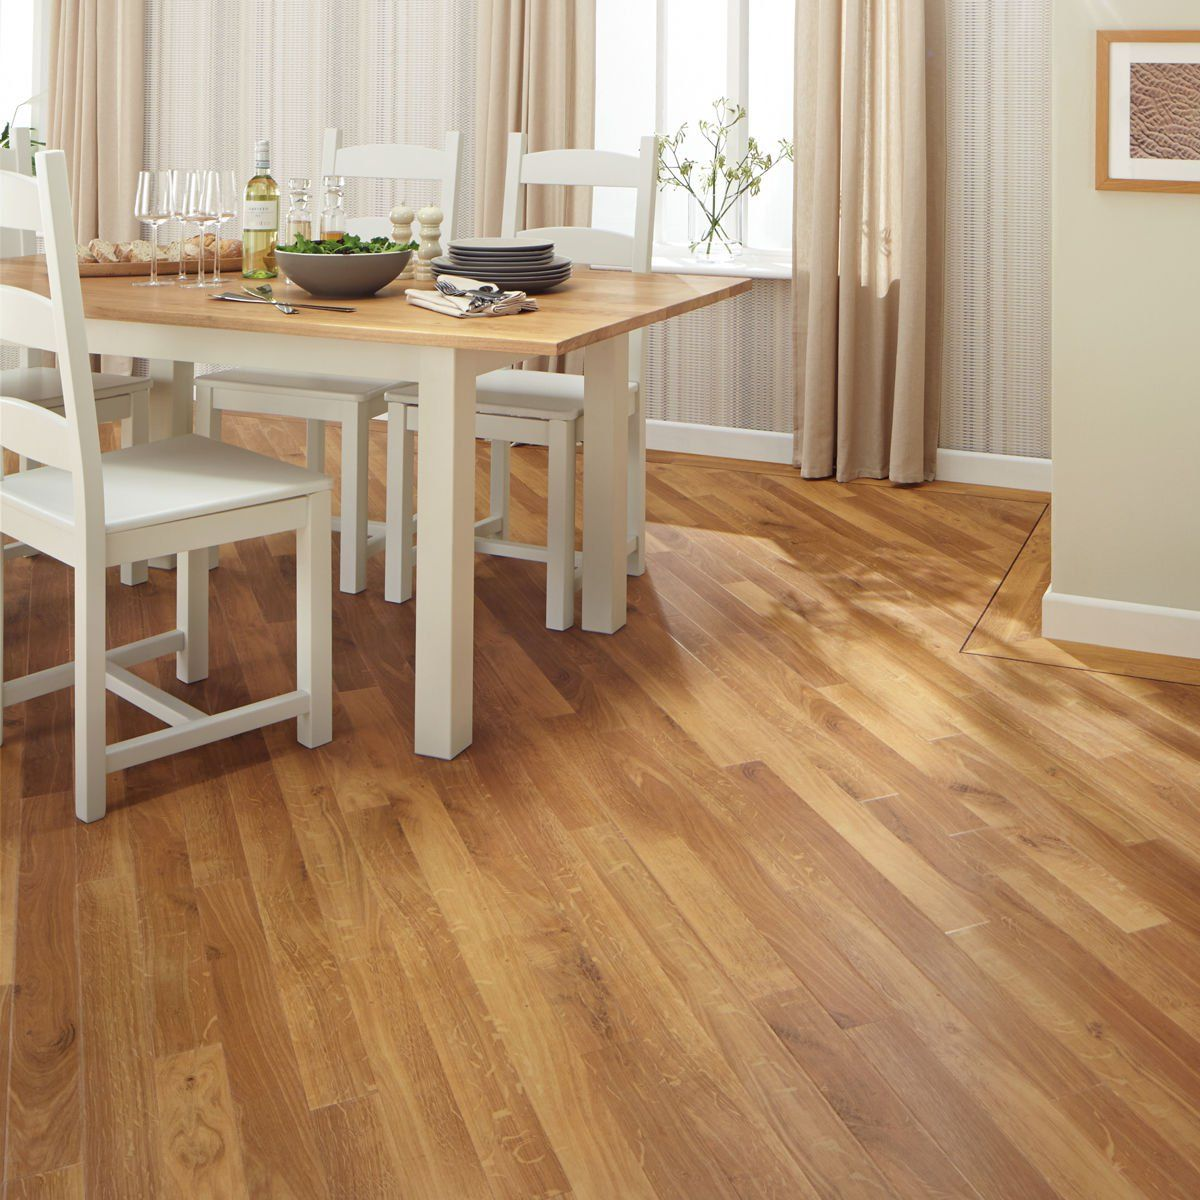 Karndean RP90 Fresco Light Oak Da Vinci vinyl flooring